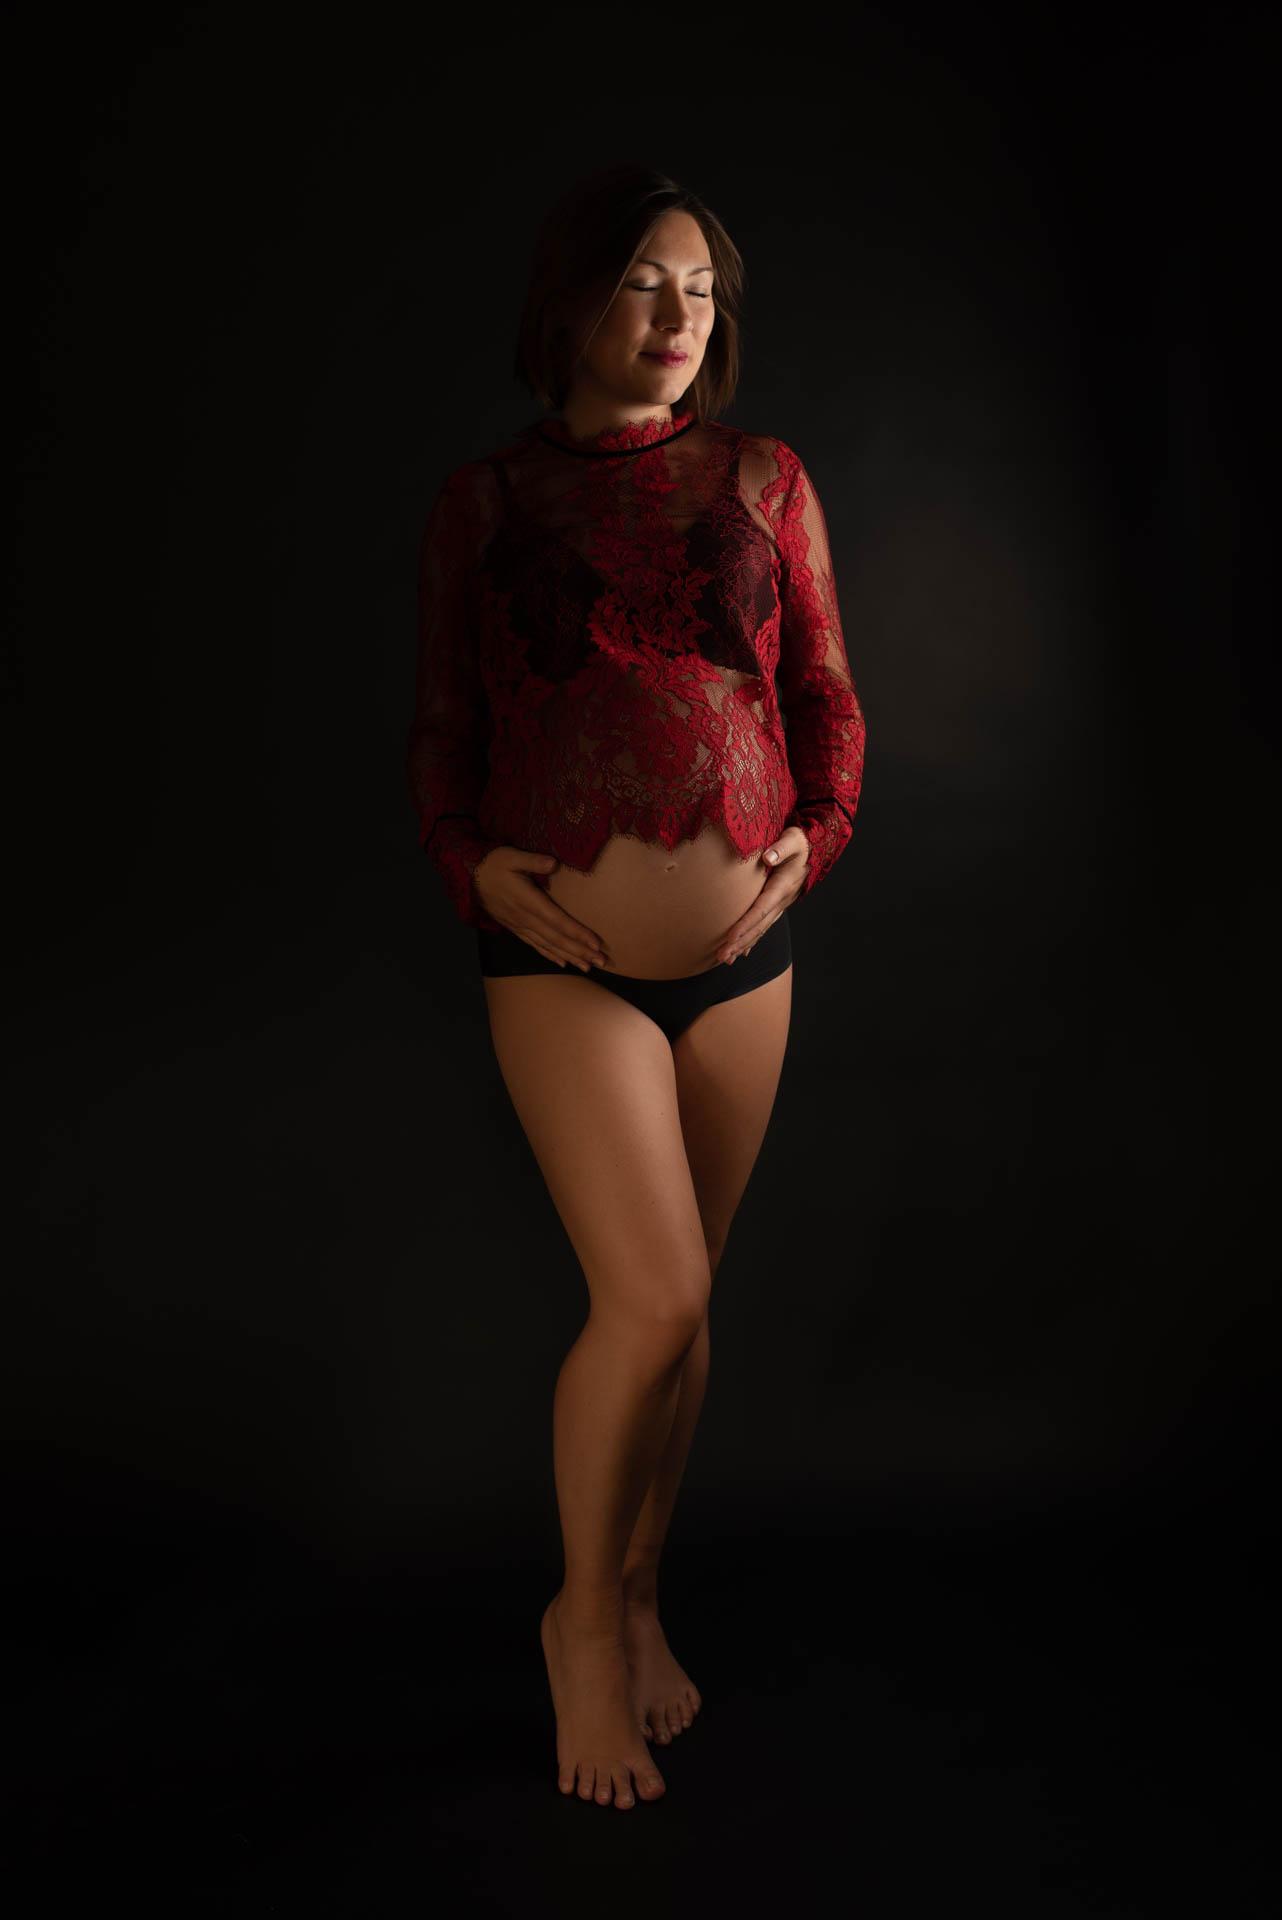 Schwangerschaftsfoto in rotem Spitzentop im Fotostudio